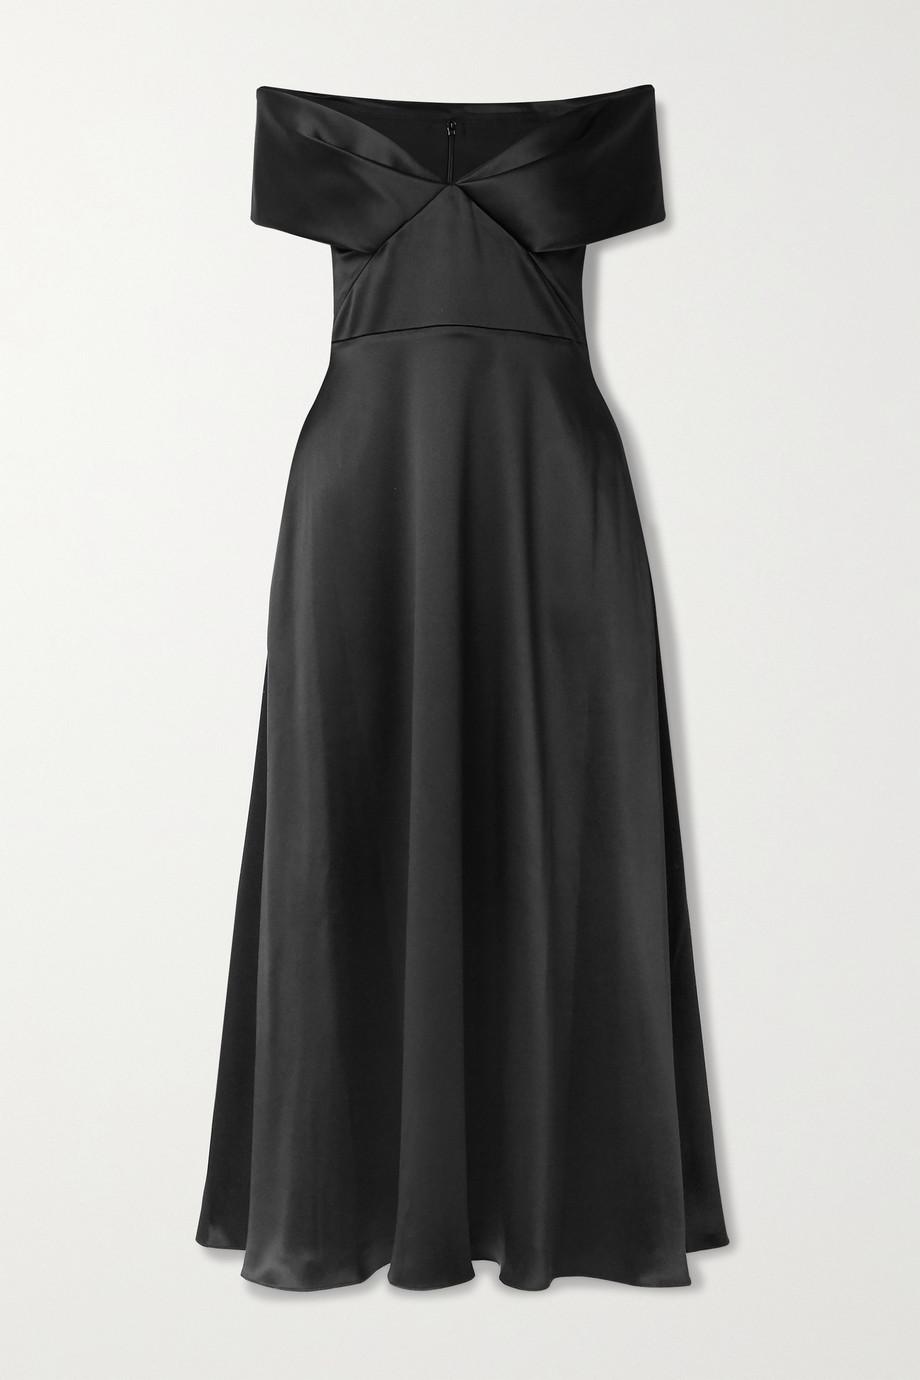 Brandon Maxwell Off-the-shoulder satin midi dress